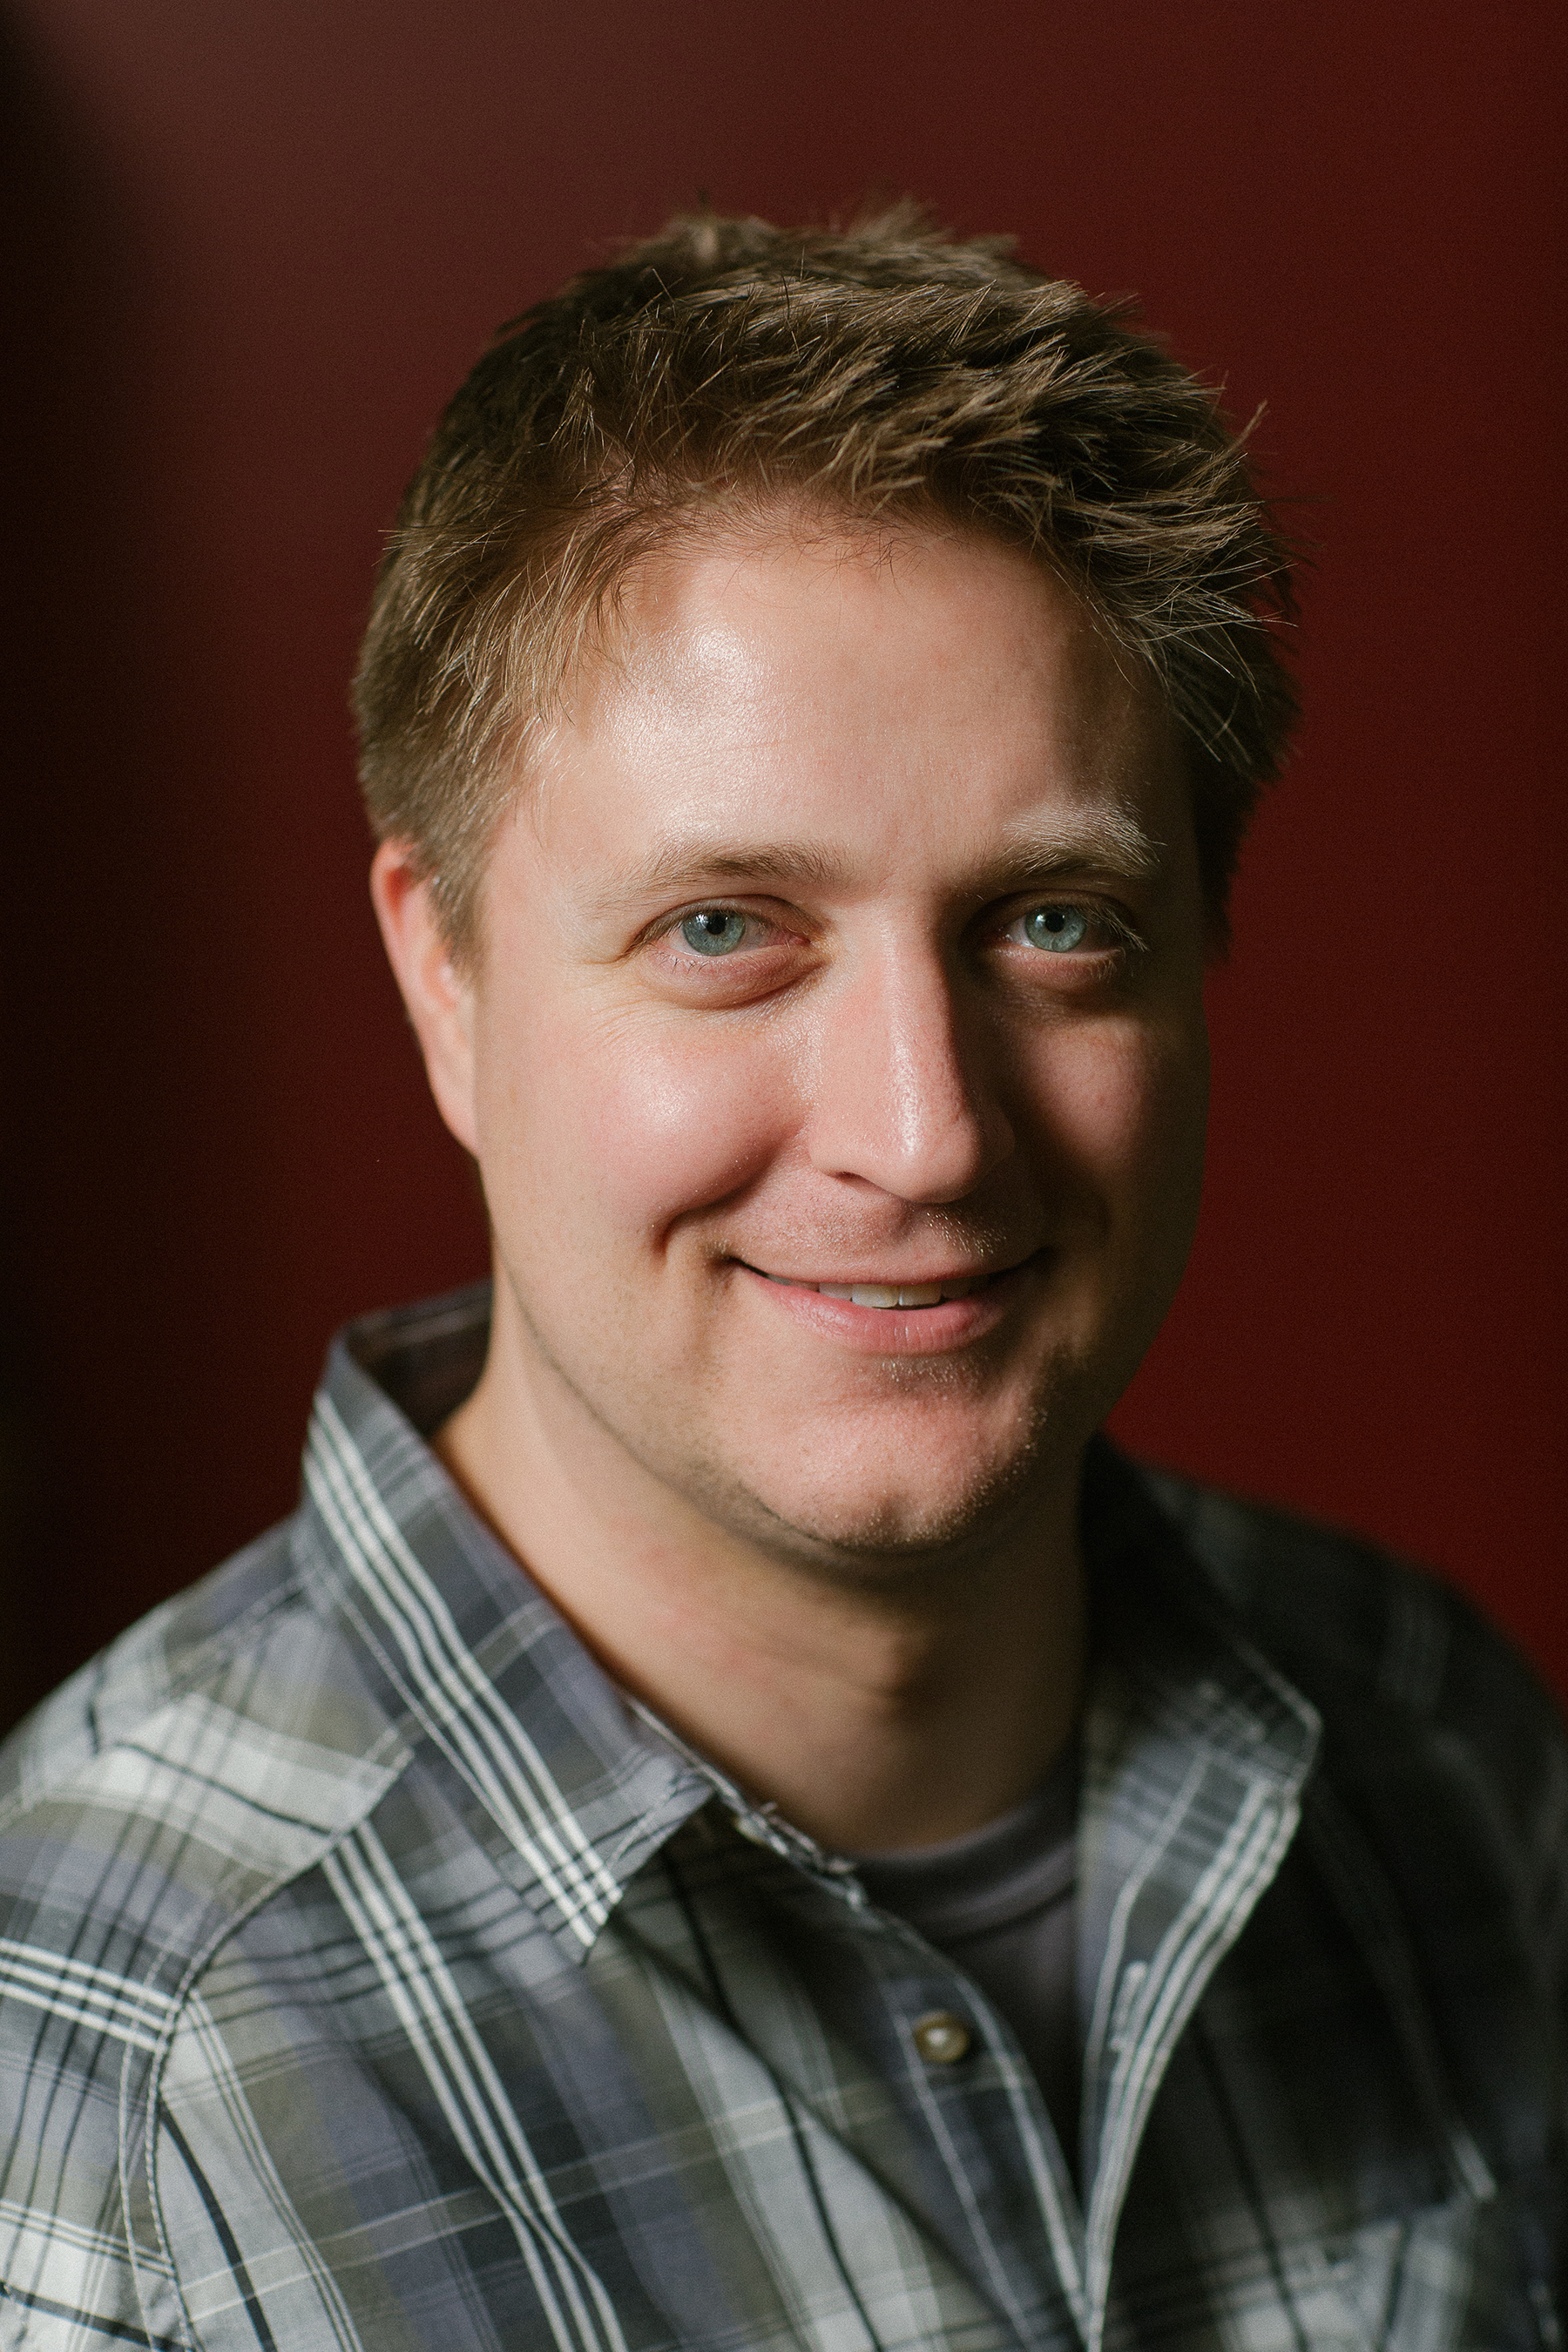 Profile picture of Gordie Haakstad